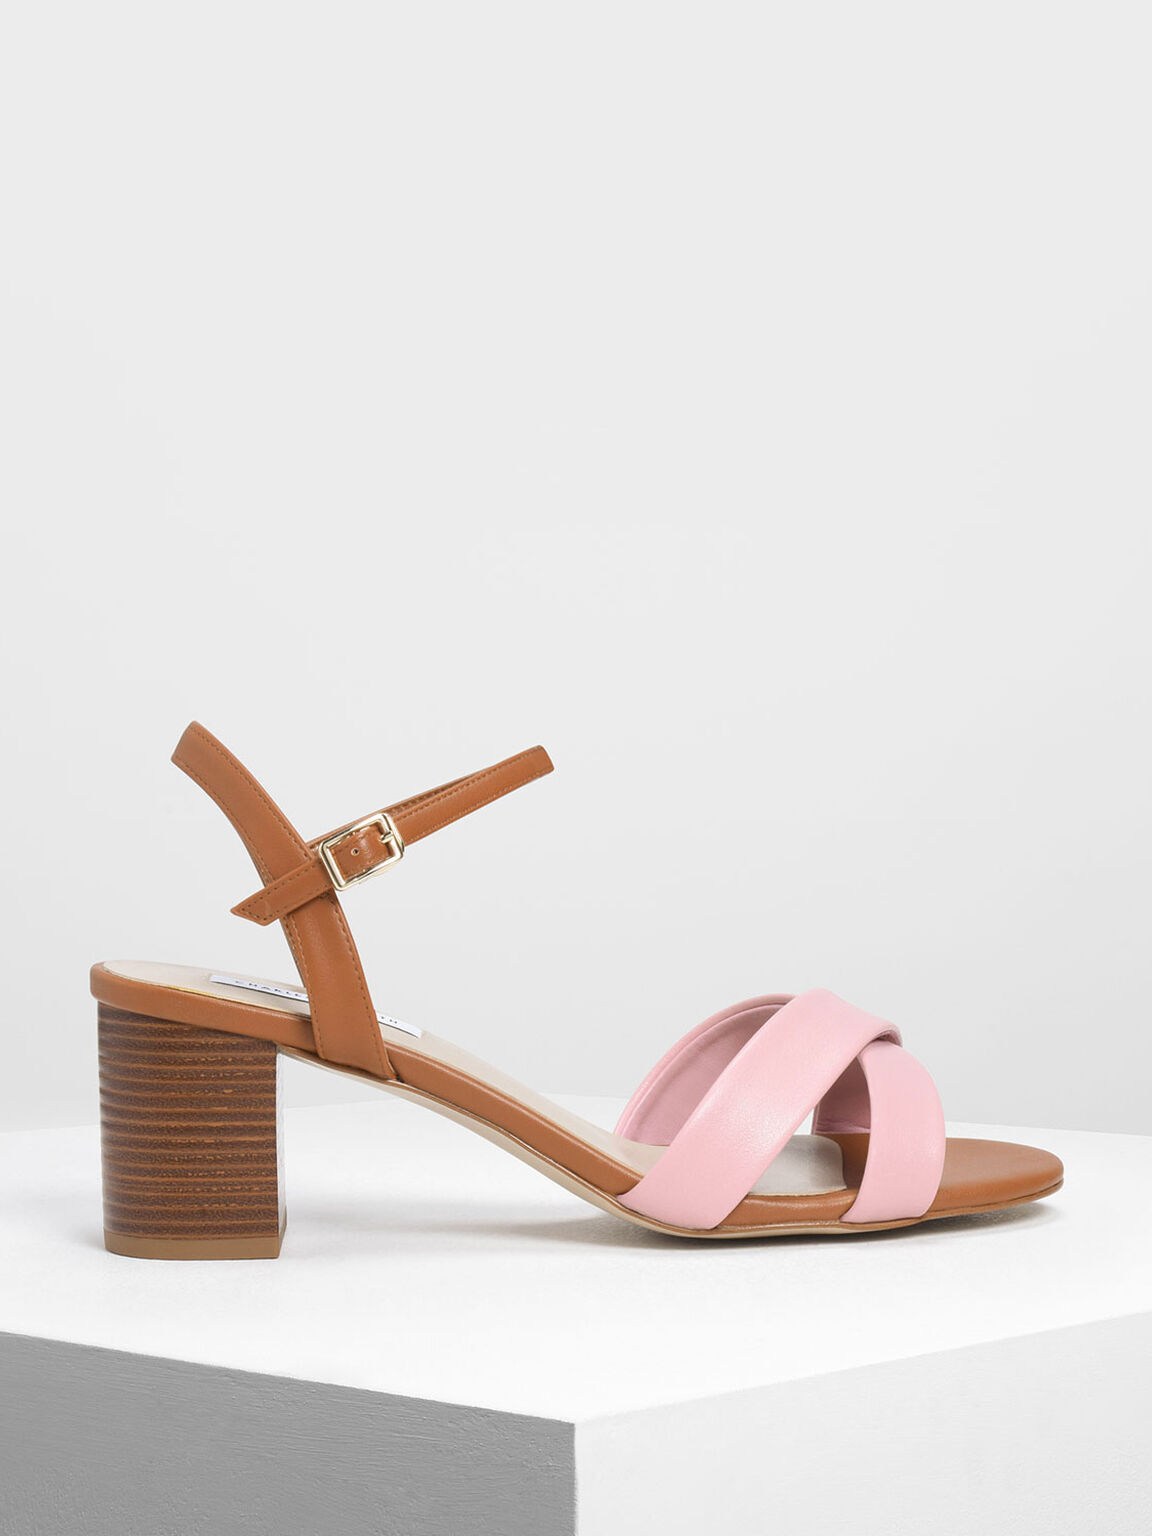 Criss-Cross Two Tone Block Heel Sandals, Pink, hi-res